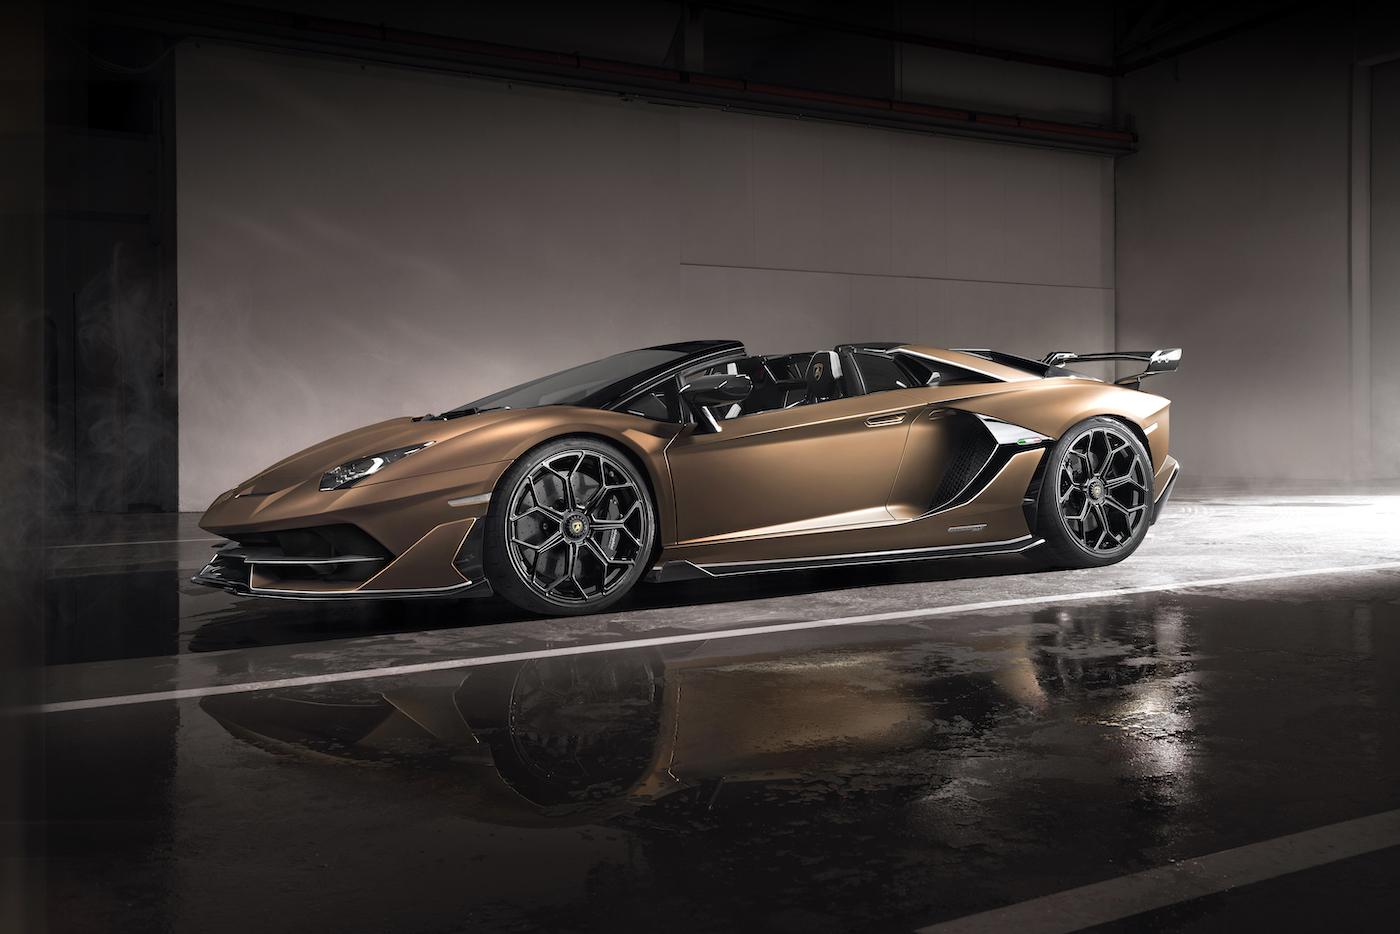 Oben ohne mit 350 km/h: Lamborghini präsentiert den Aventador SVJ Roadster in Genf 4